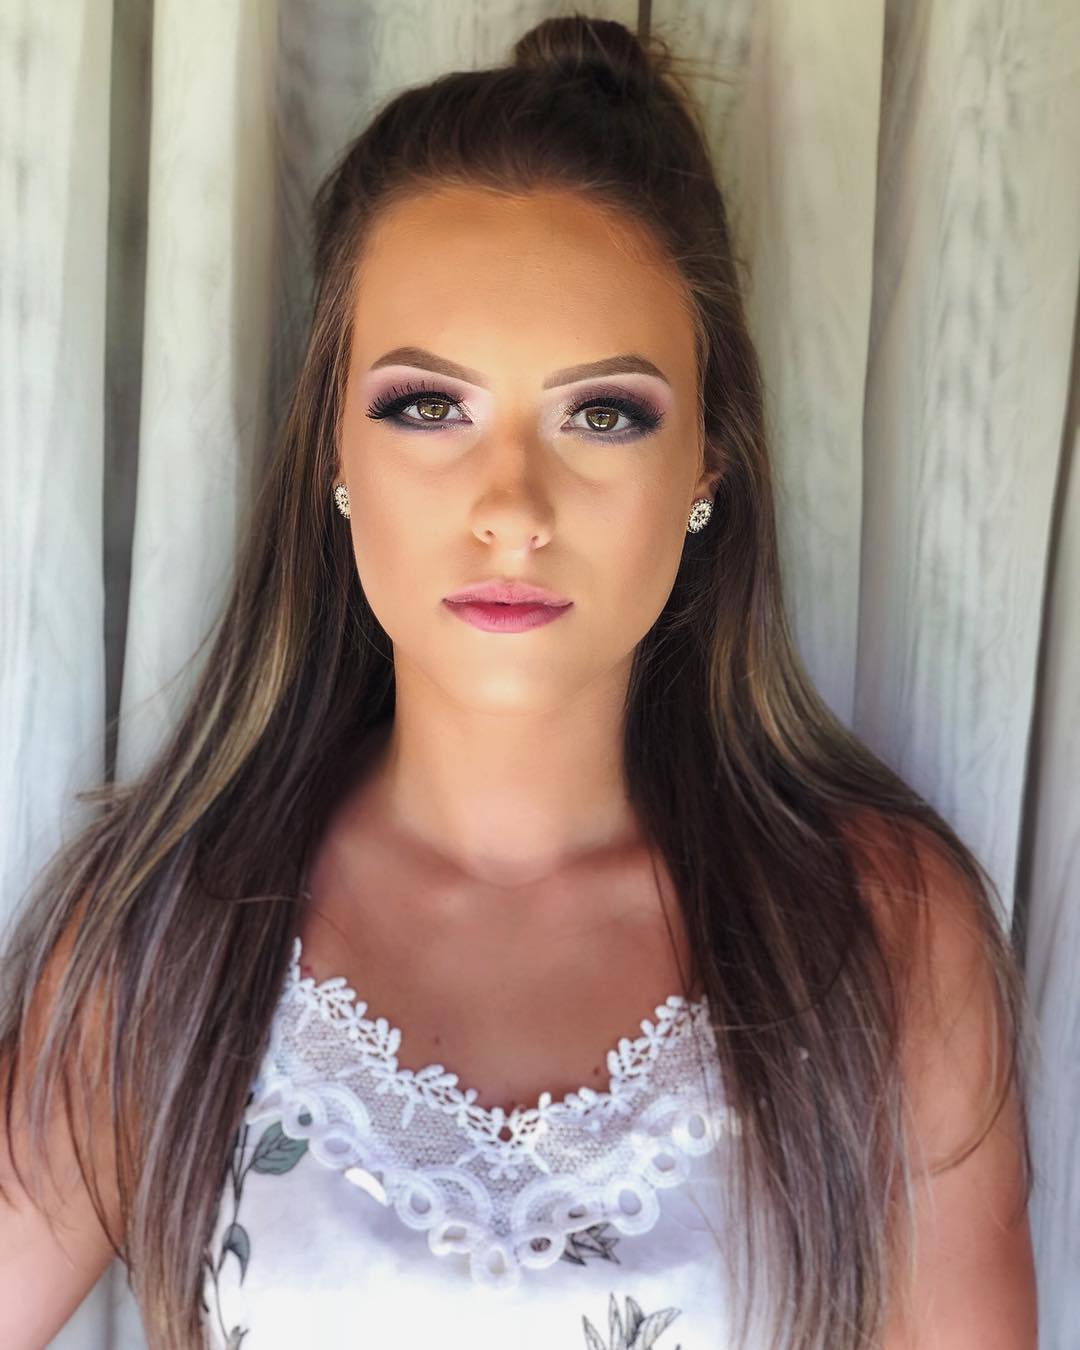 cristine boff sartor, segunda finalista de miss latinoamerica 2019. - Página 2 27574210